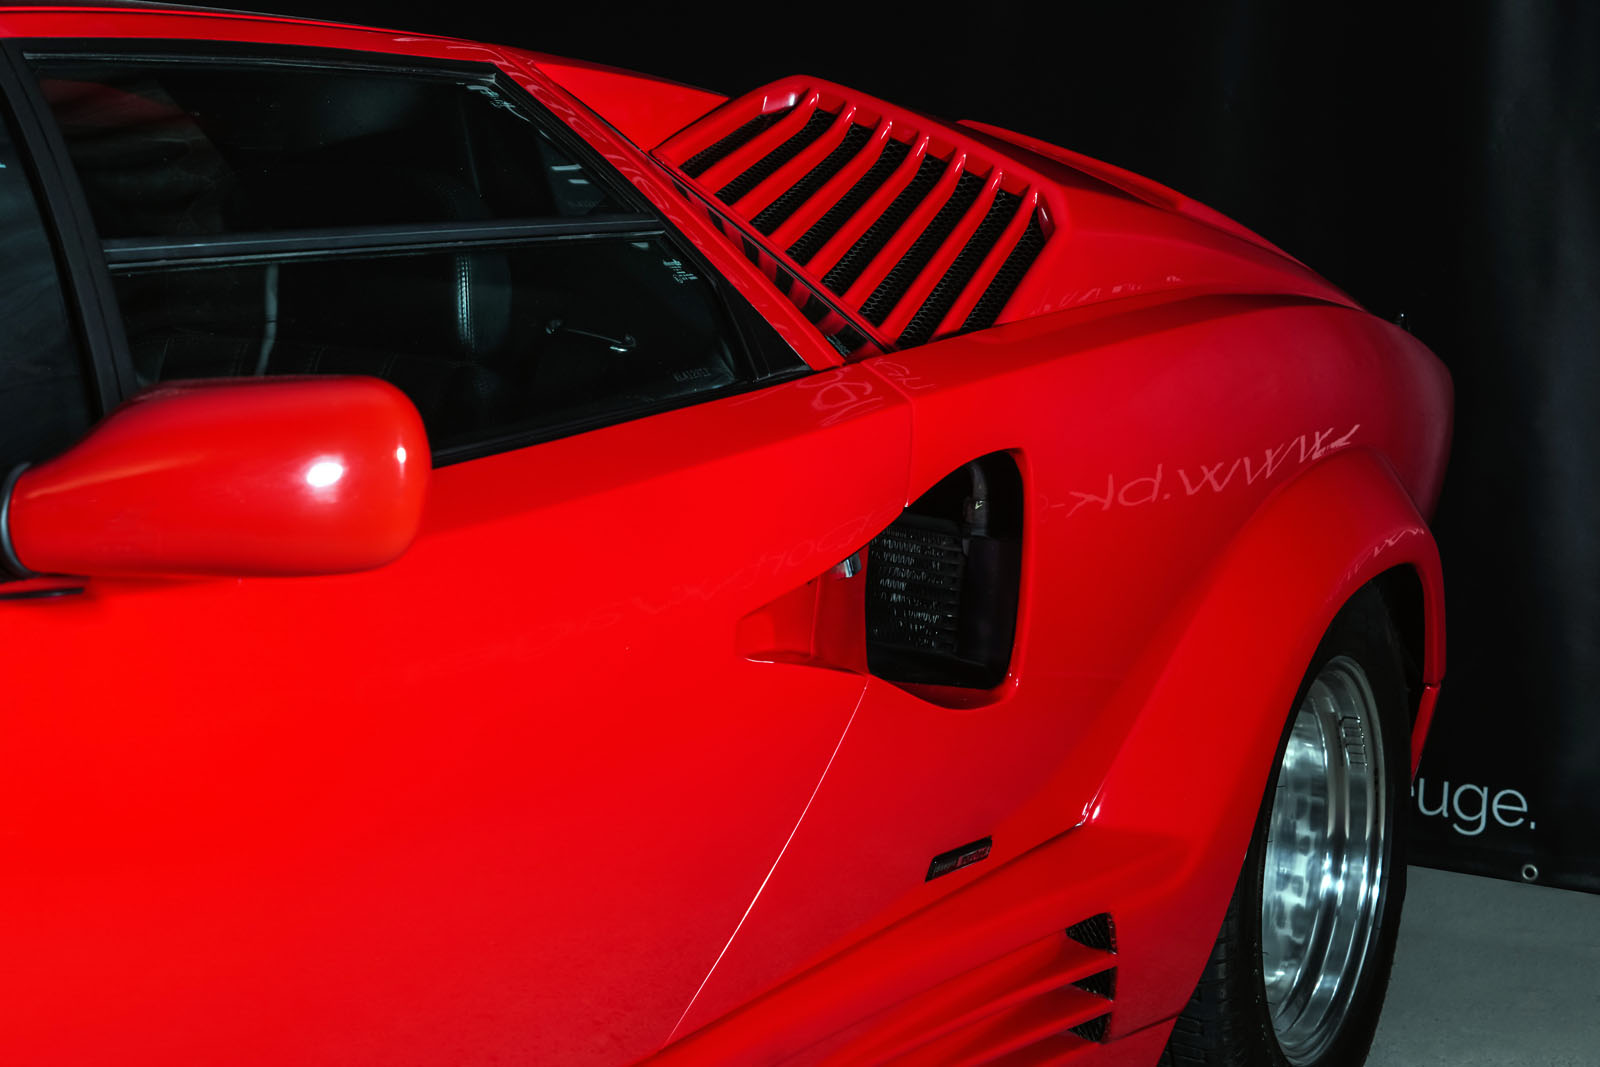 Lamborghini_Countach_Rot_Schwarz_LAM-2811_13_w